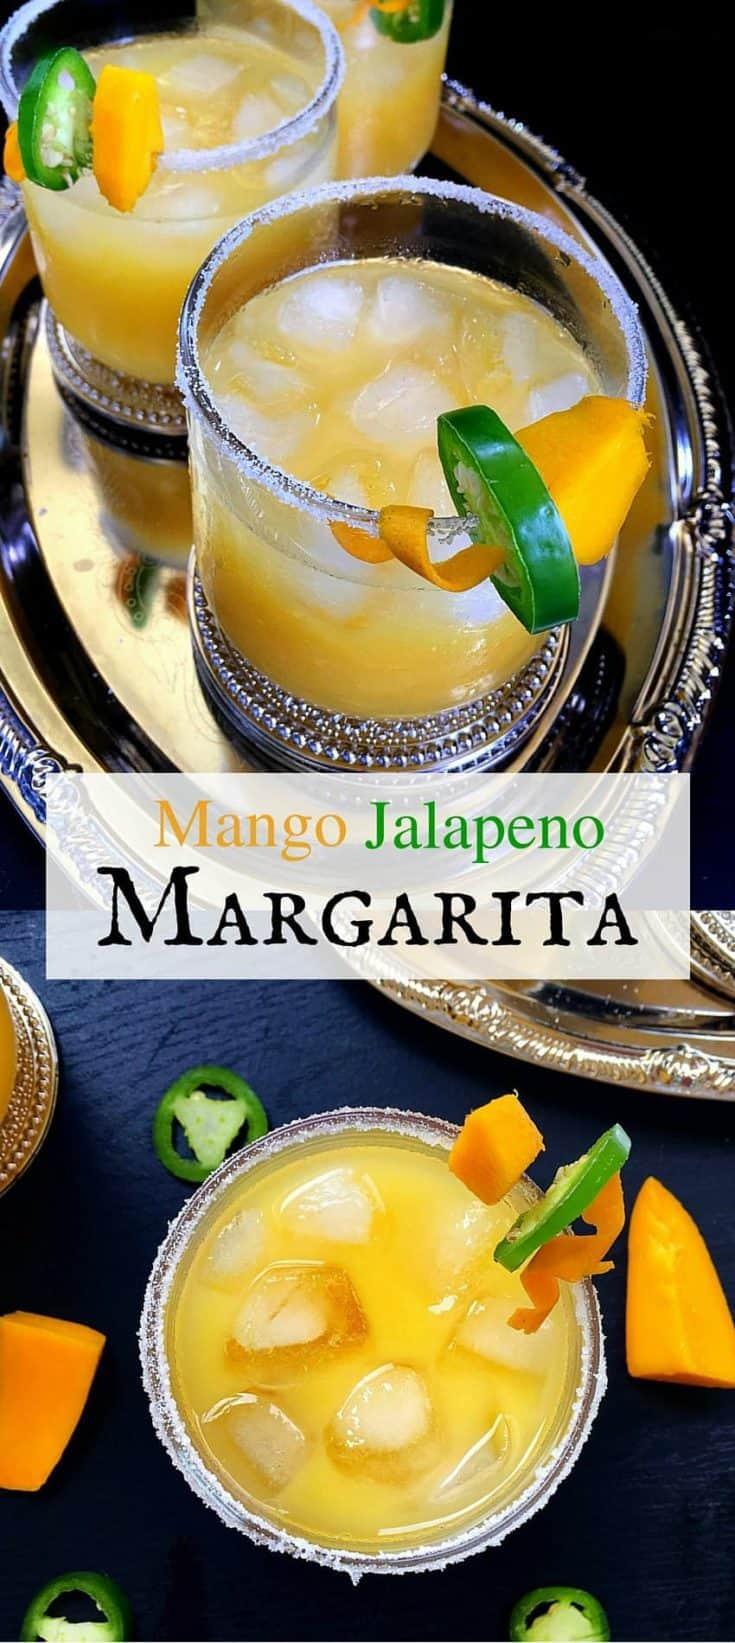 Mango Jalapeno Margarita (3 Mins Drink) #mango #margarita #drinks #cincodemayo #mothersday #tequila